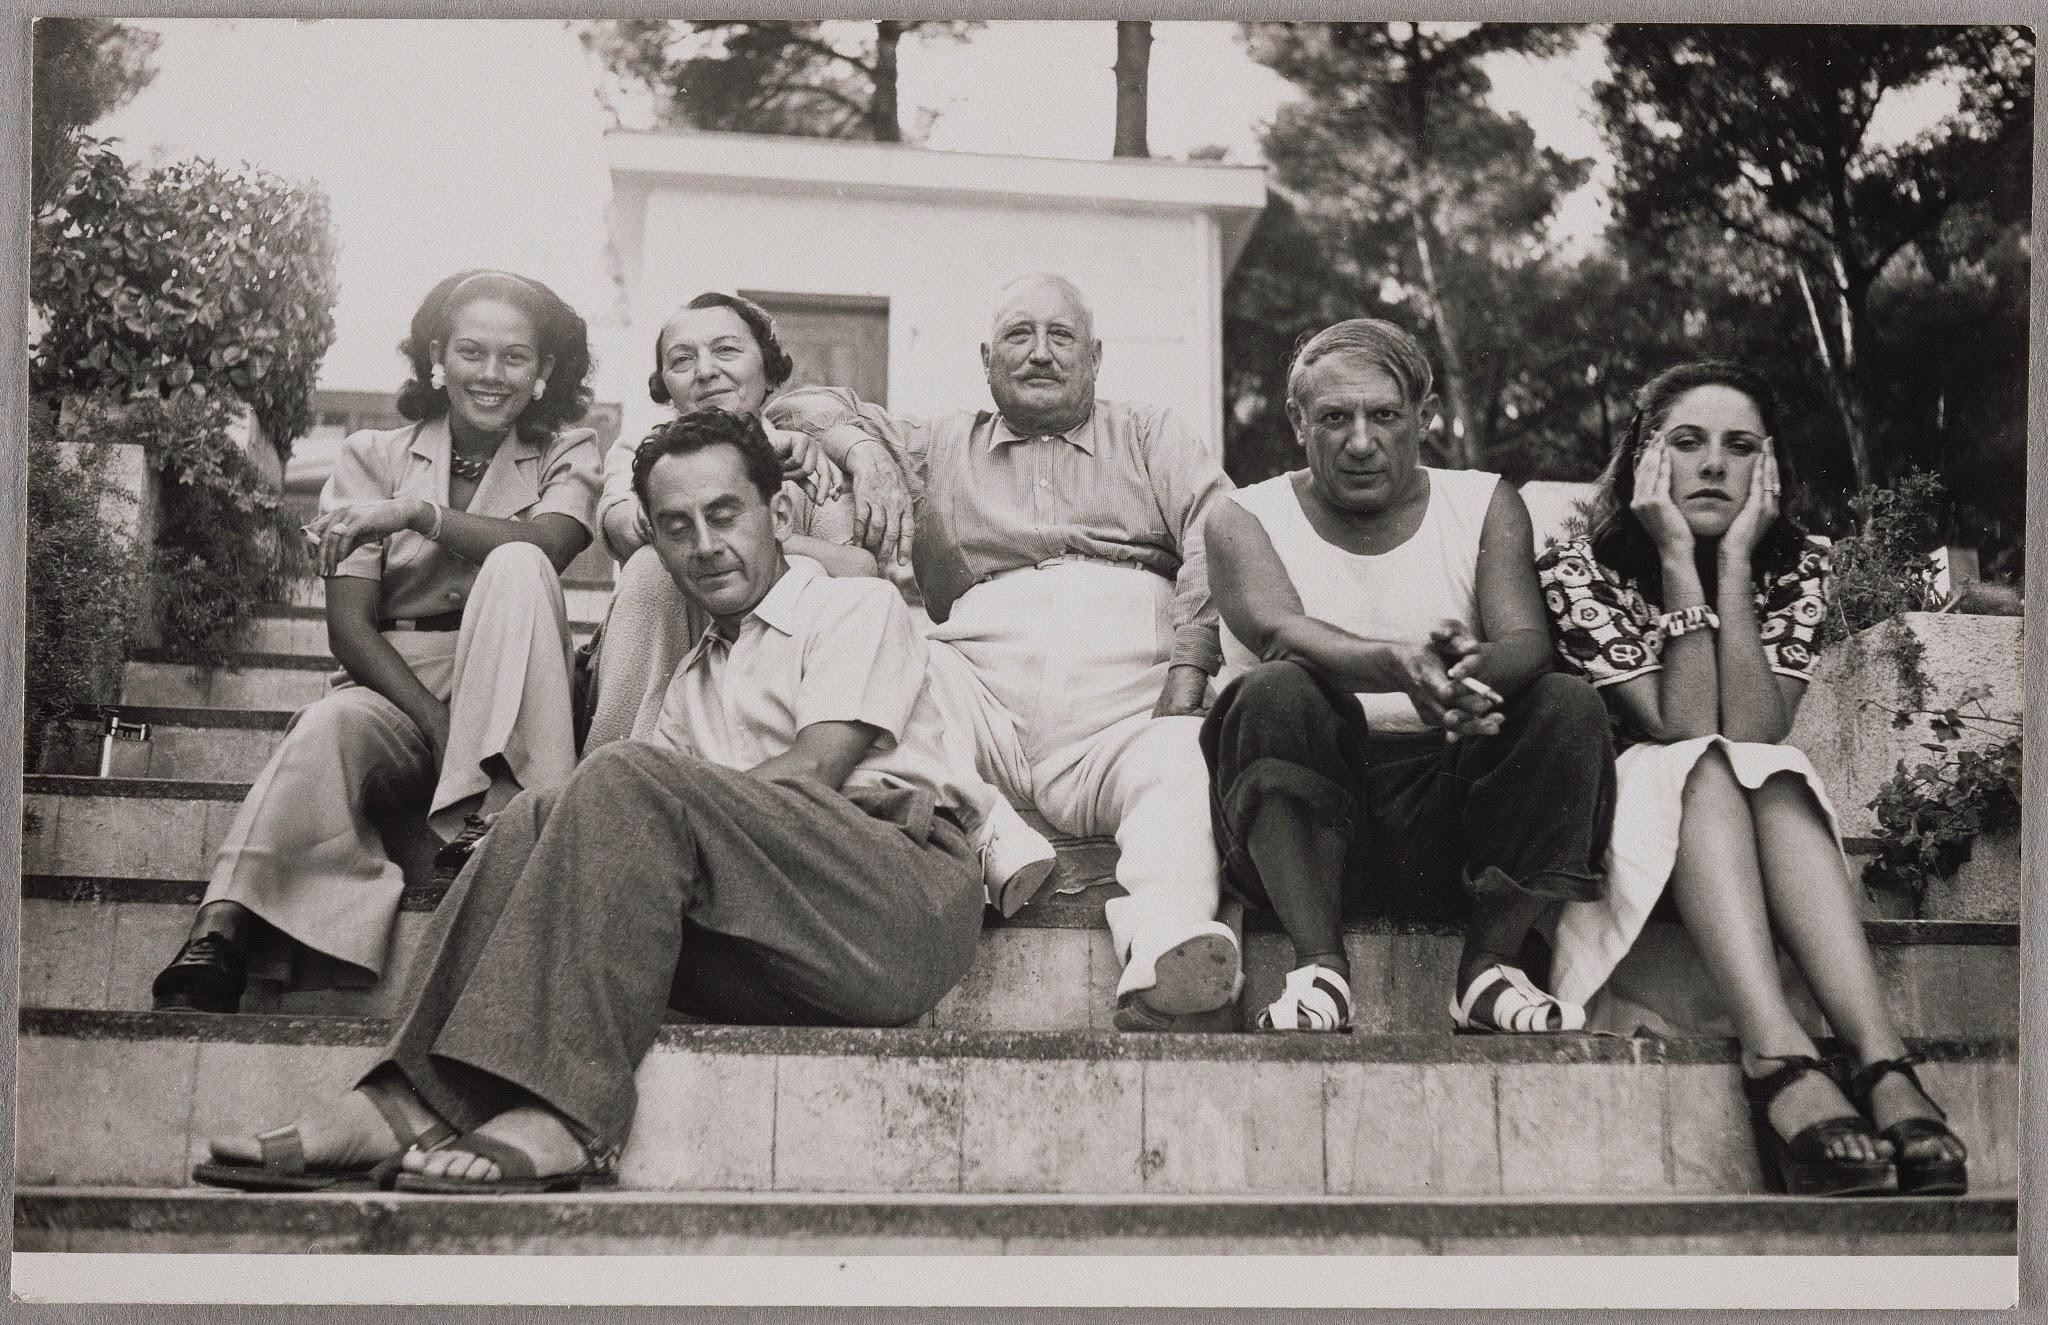 Ady Fidelin, Marie-Cuttoli, Man Ray, Picasso et Dora Maar, 1937 par Man Ray, photo ©Man Ray Trust, ADAGP Paris et DACS Londres 2017